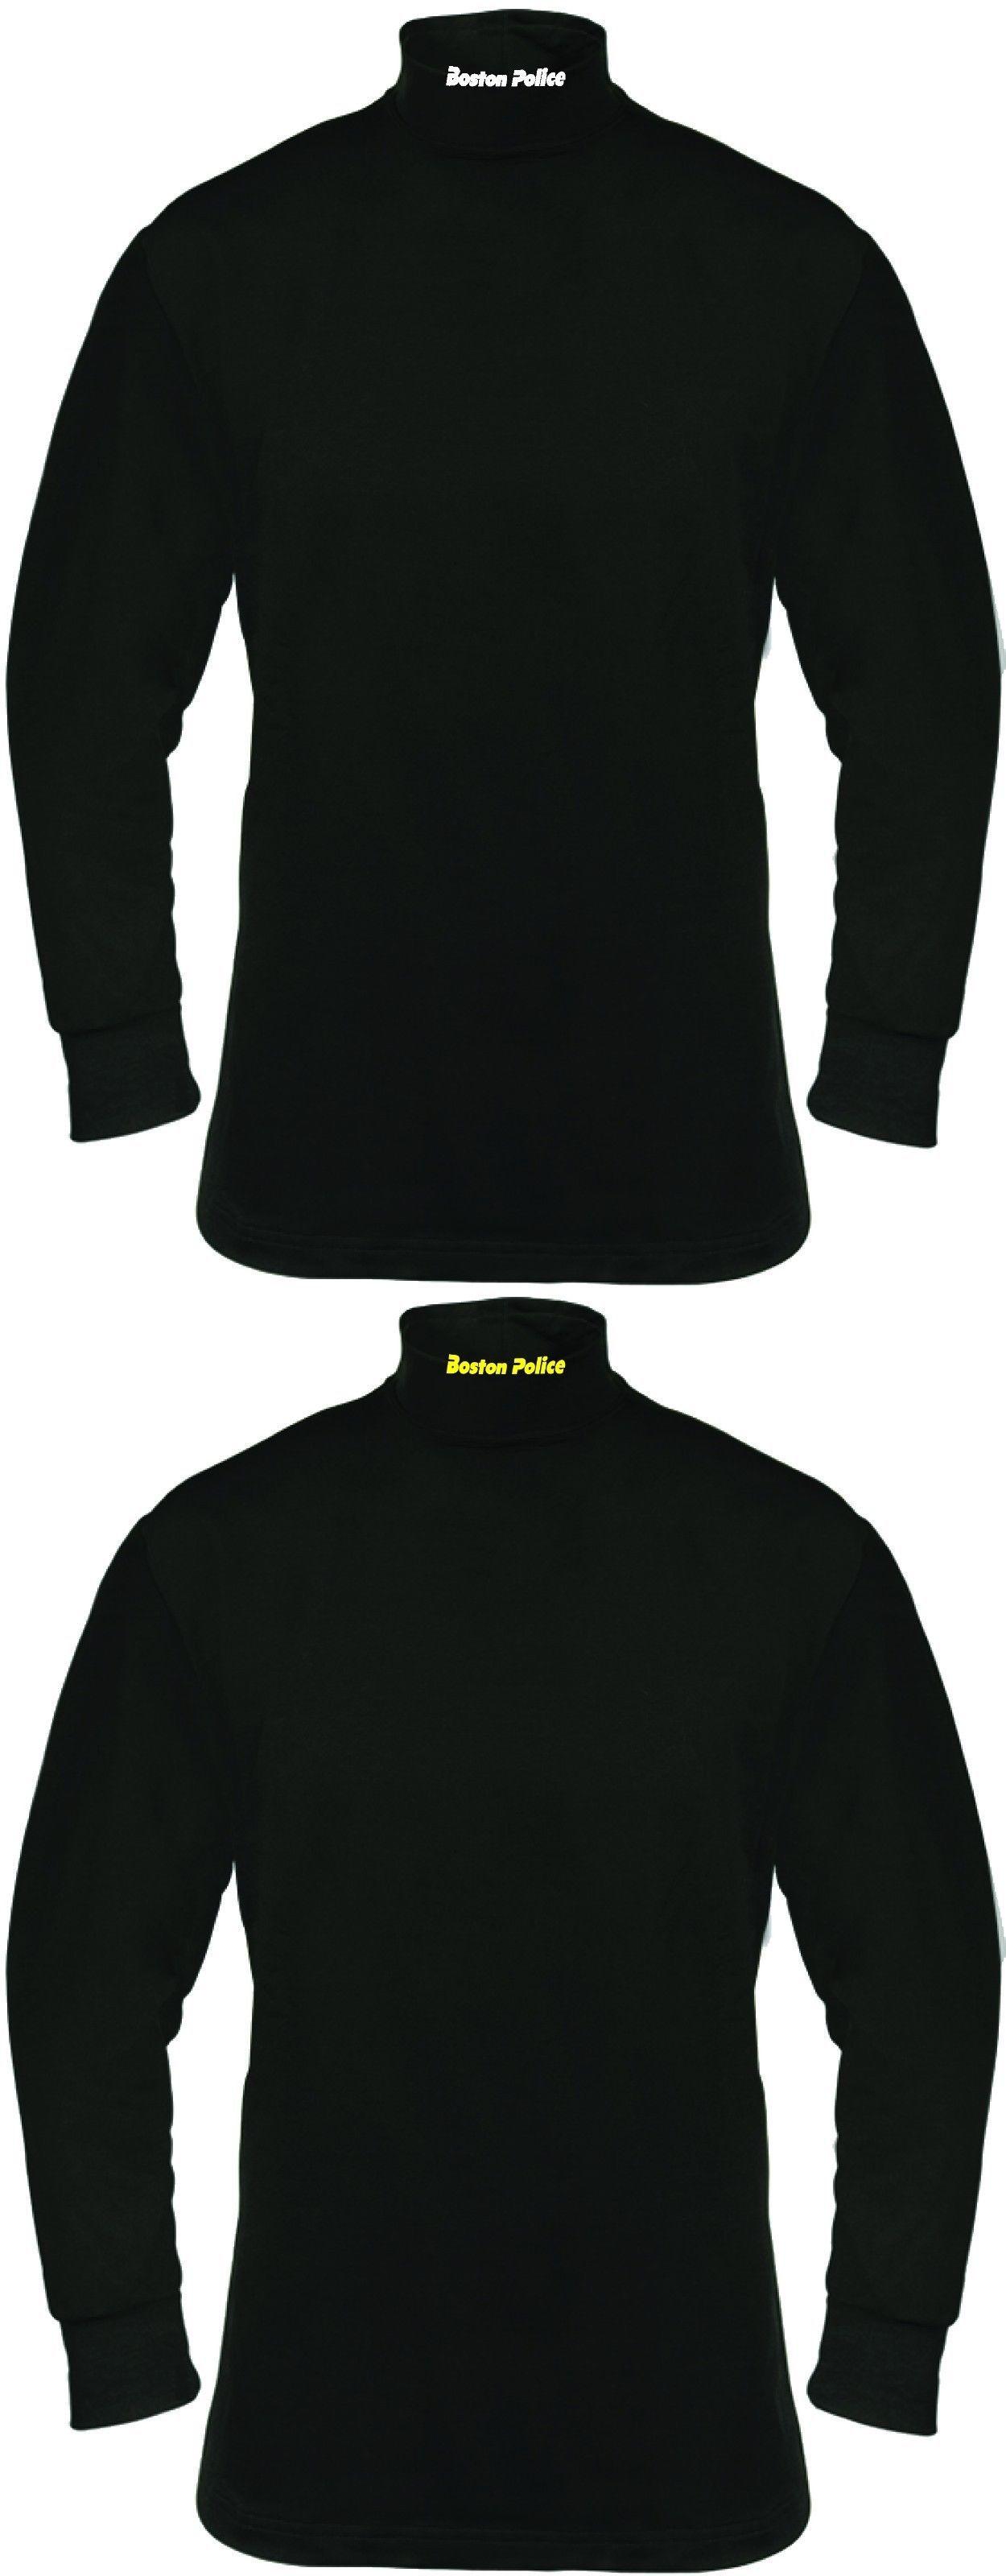 Do Ariat Fr Shirts Shrink   RLDM